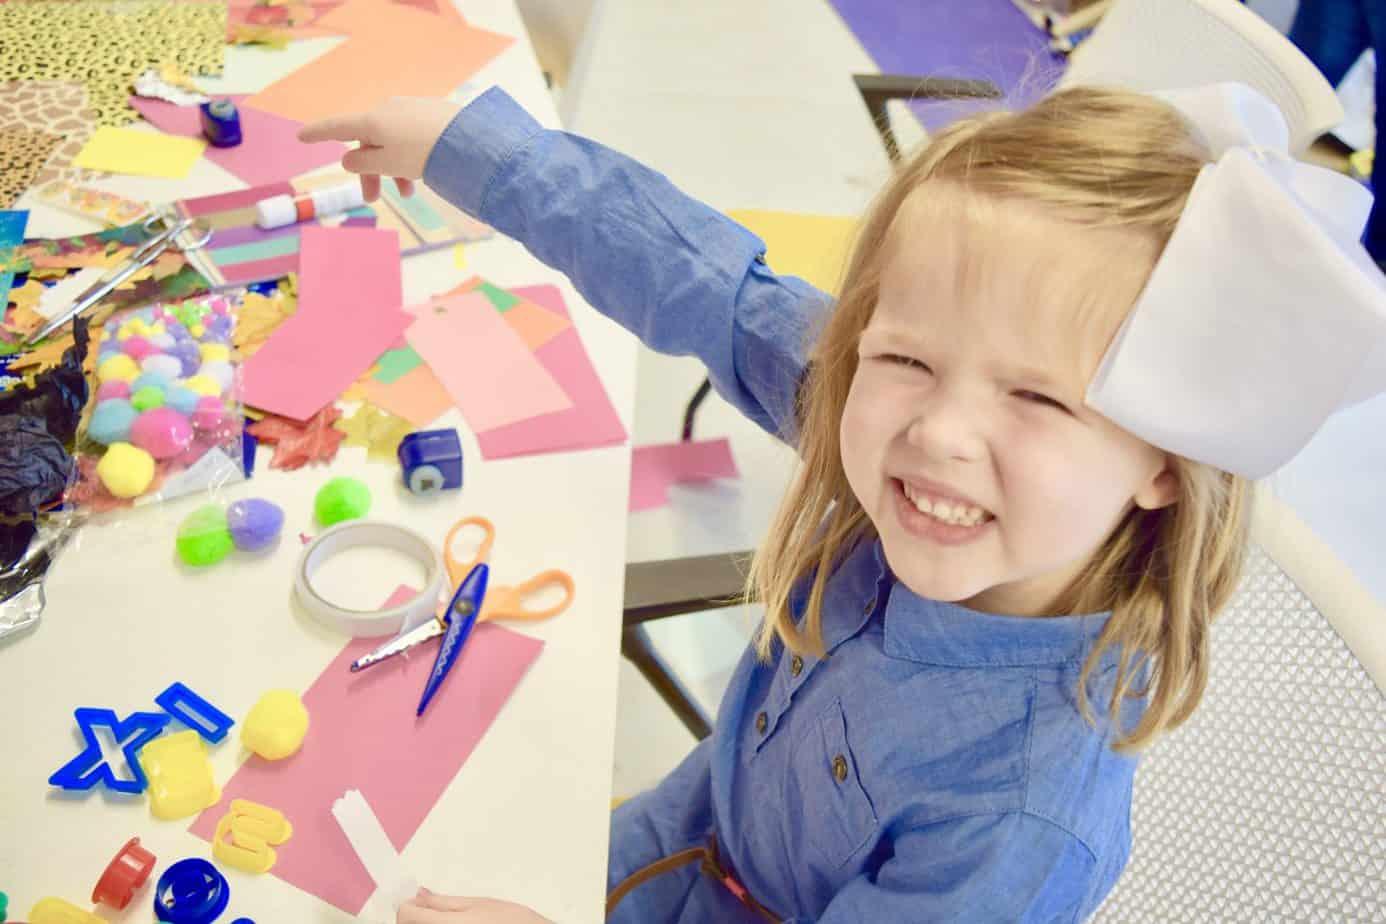 W enjoying some crafts at Playfest, playtopia